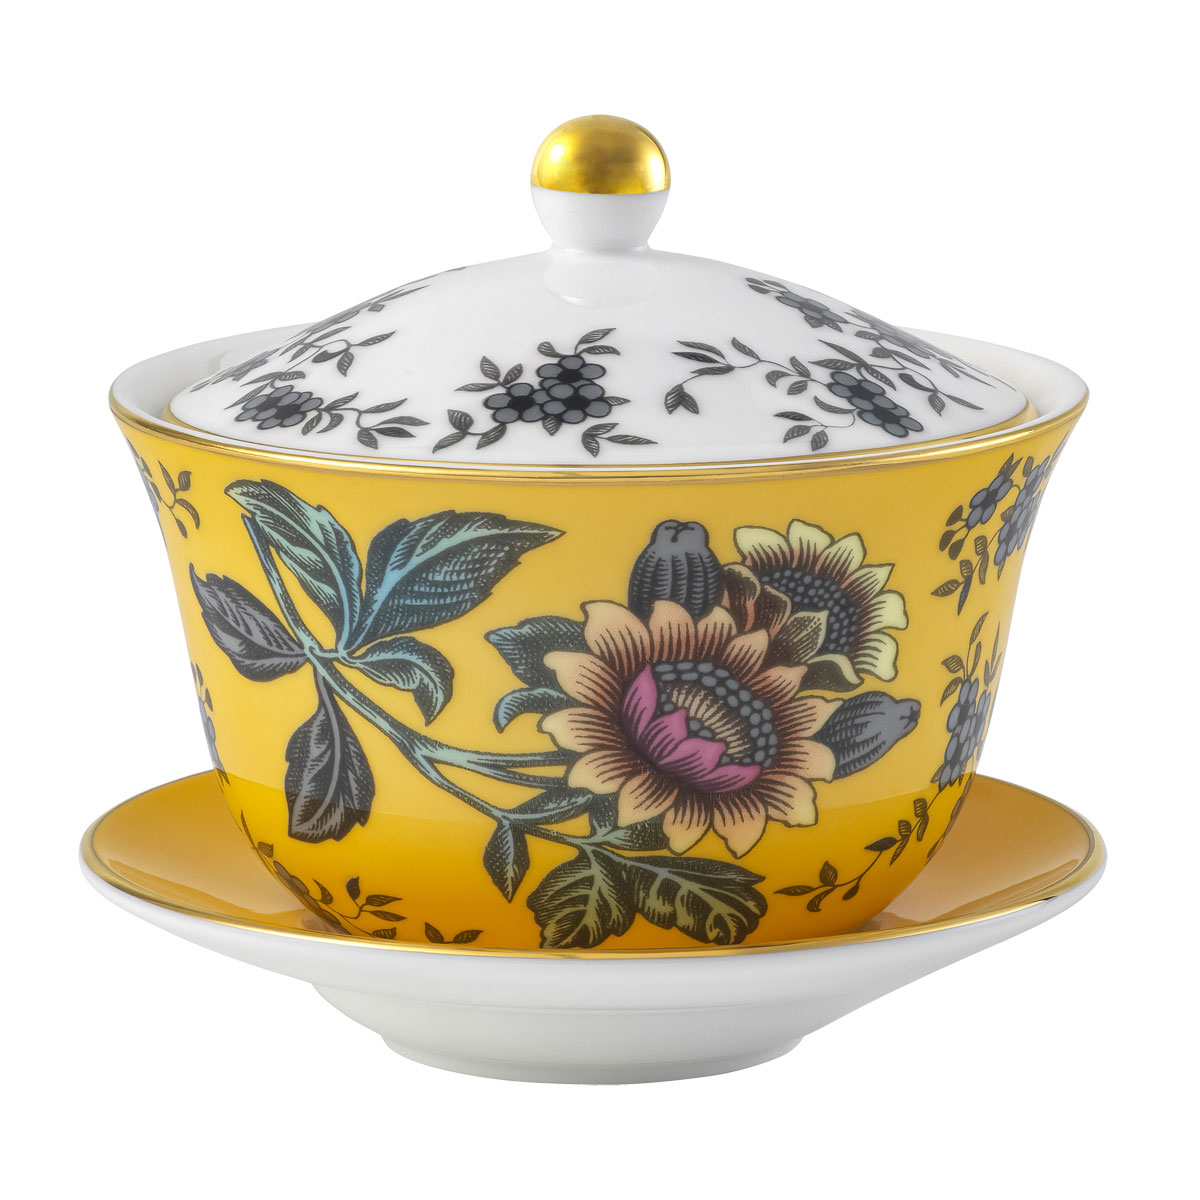 Wedgwood Wonderlust Lidded Bowl Yellow Tonquin